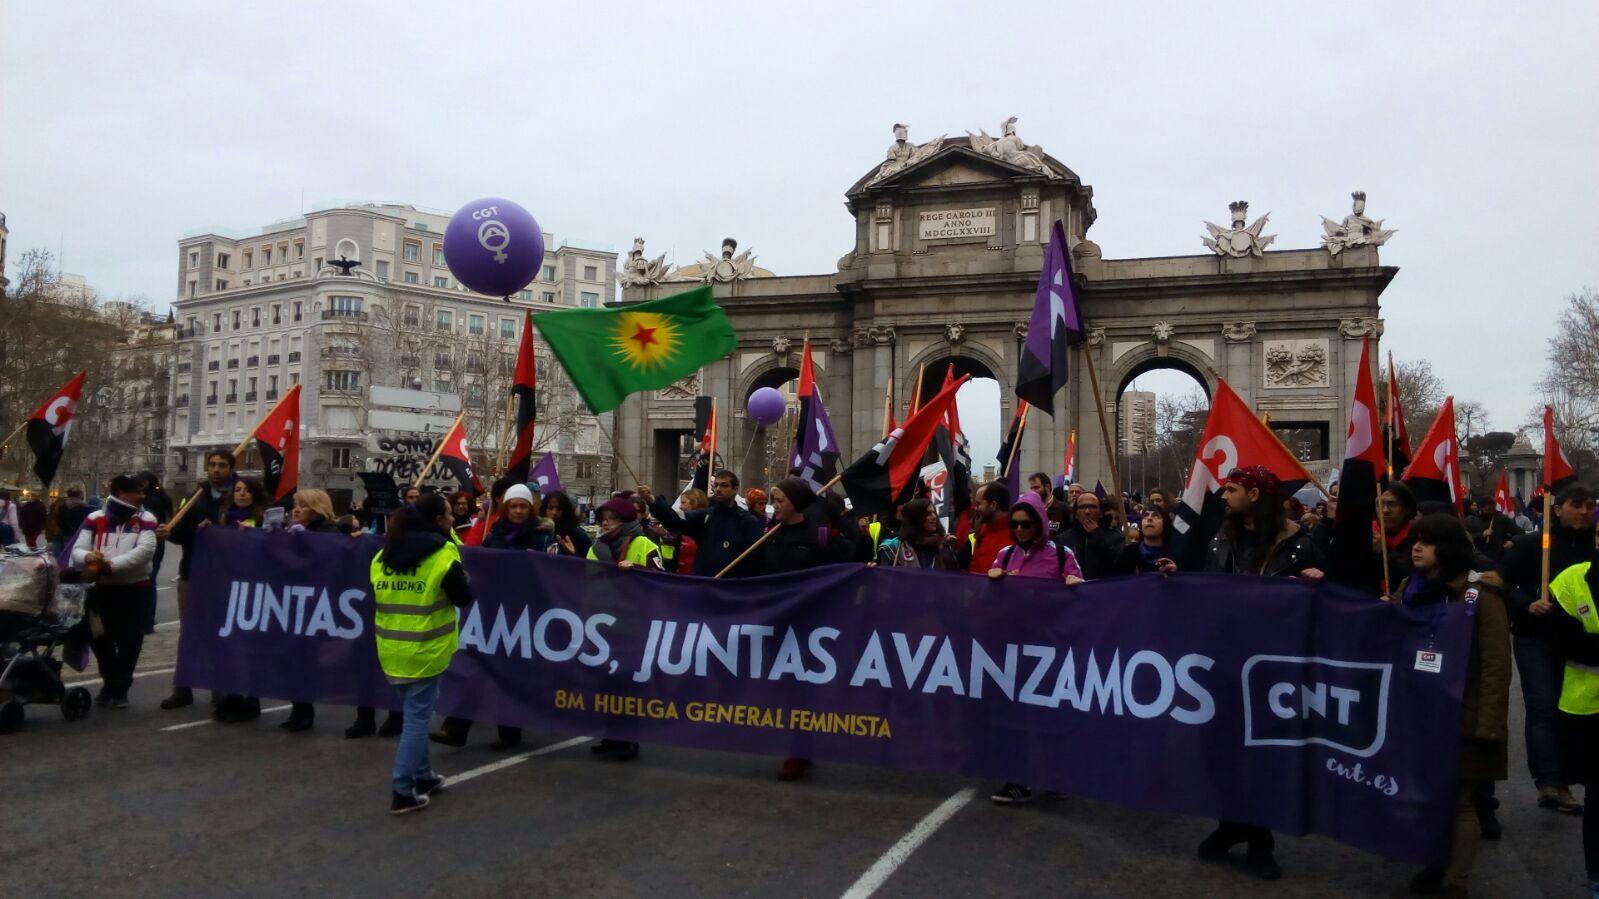 https://comarcalsur.cnt.es/wp-content/uploads/2018/03/mani-18.jpg